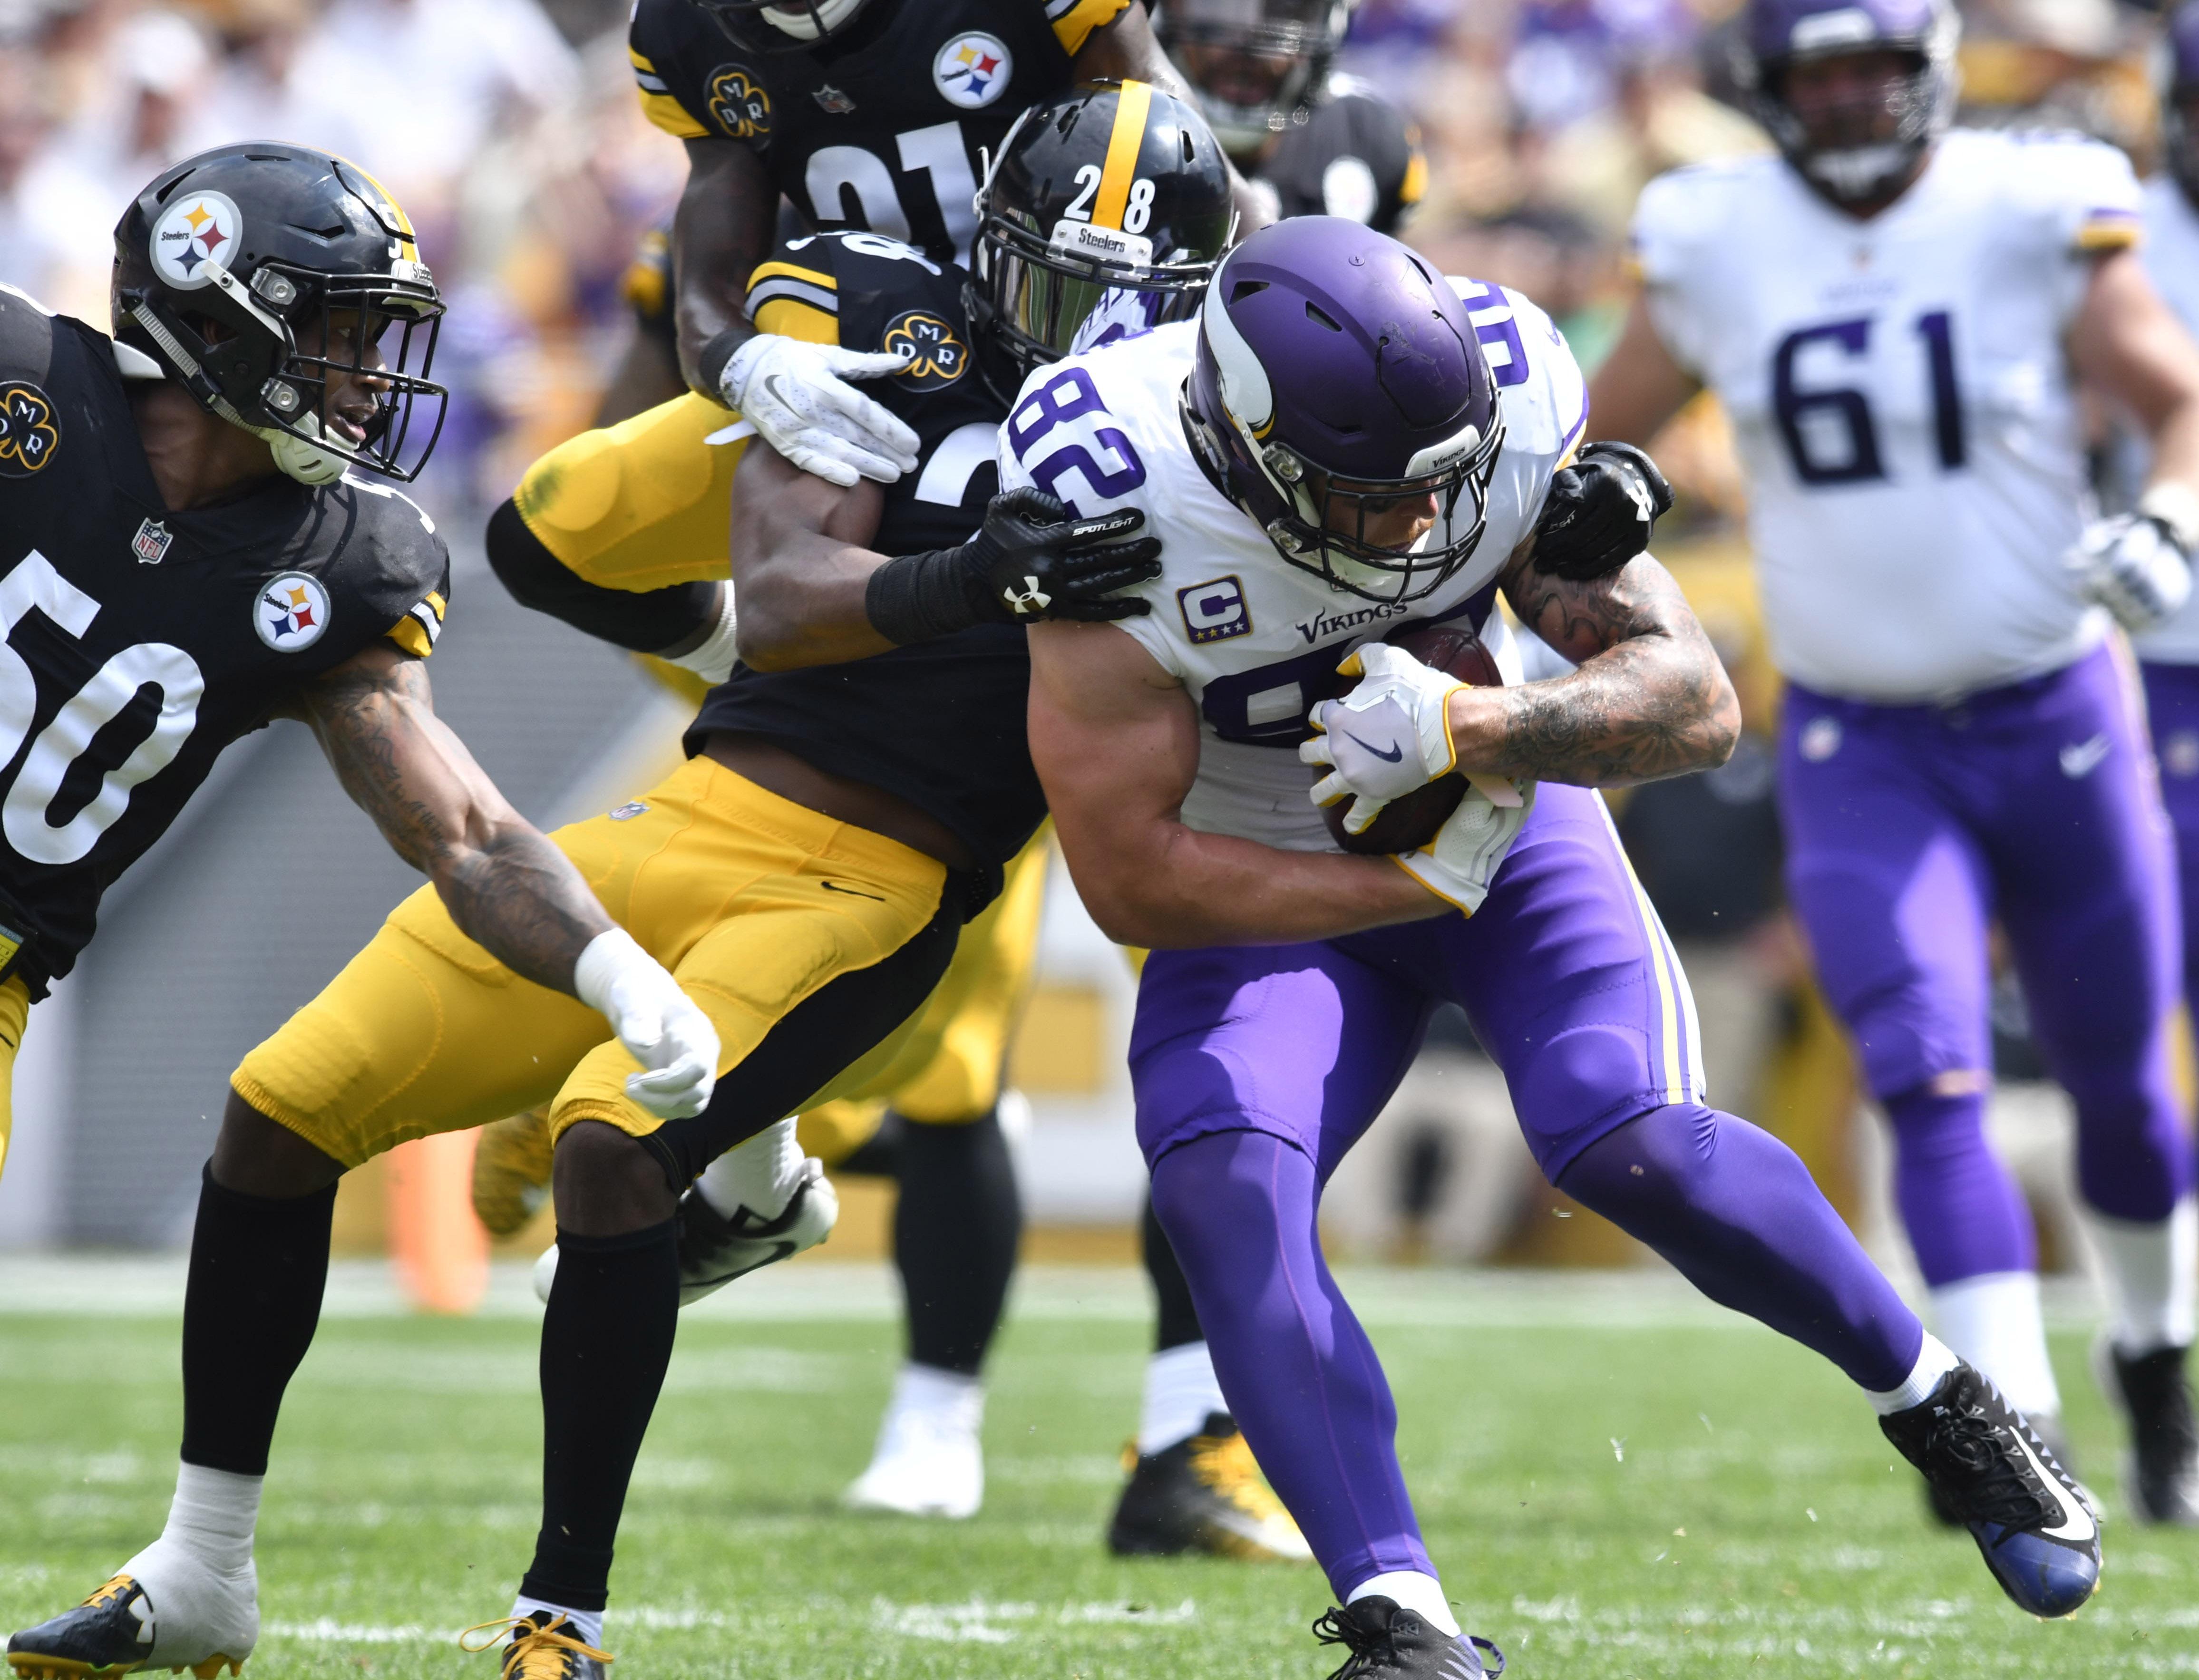 NFL: Minnesota Vikings at Pittsburgh Steelers